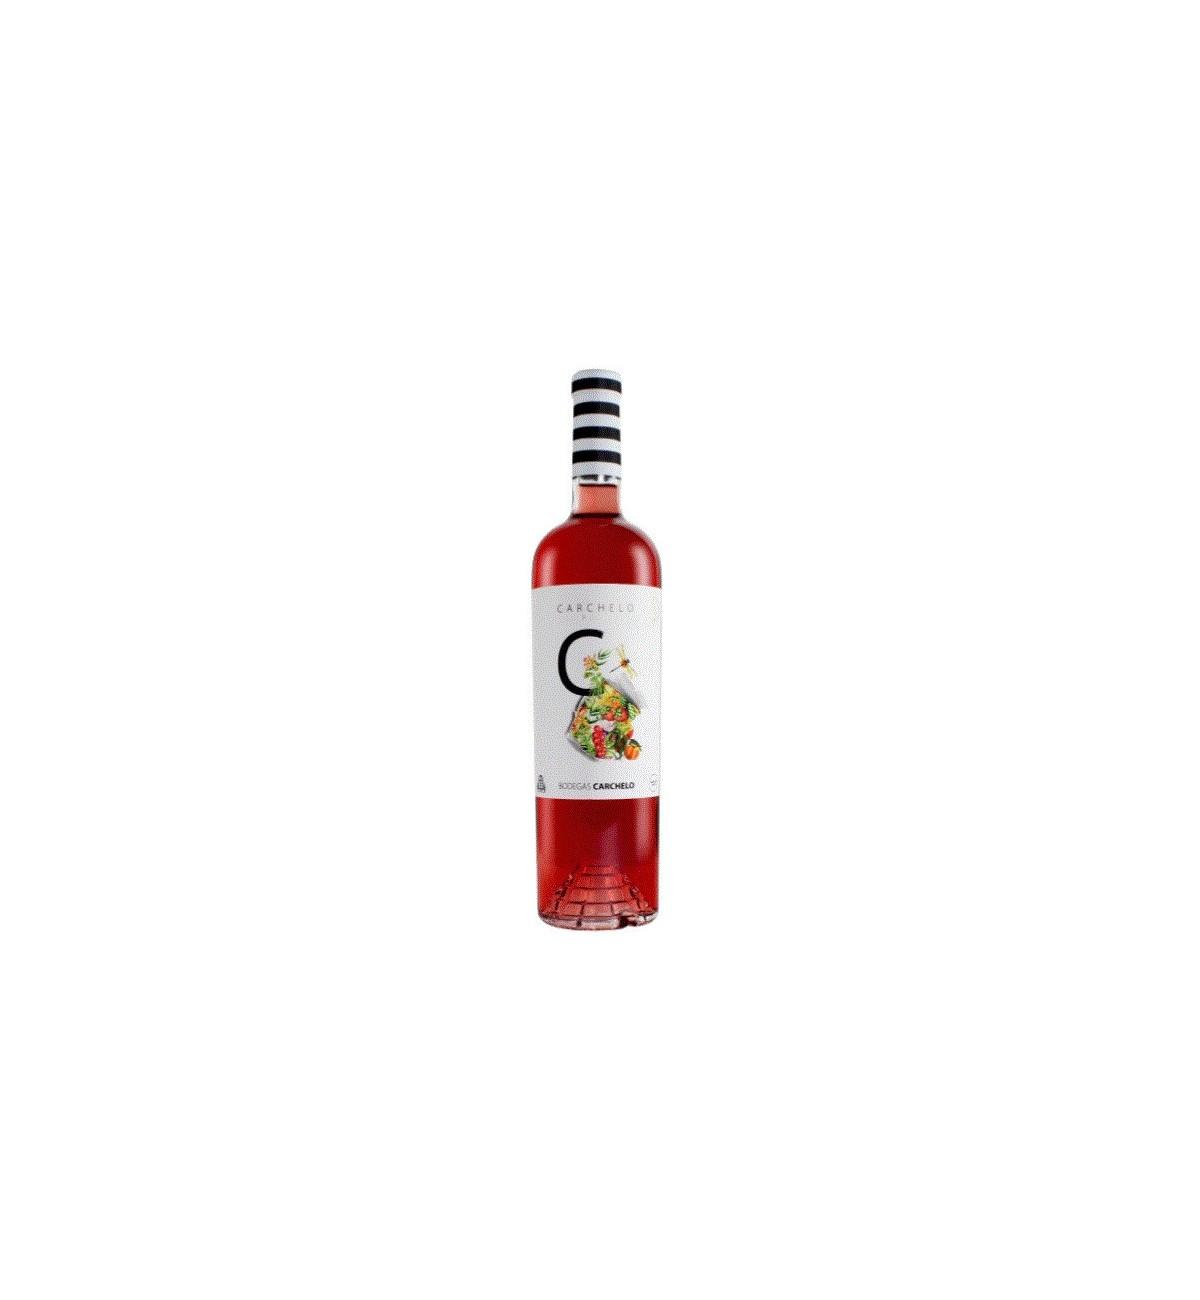 Carchelo Rosé  * Vino Rosado, Monastrell, Ecológico, Vegano Jumilla